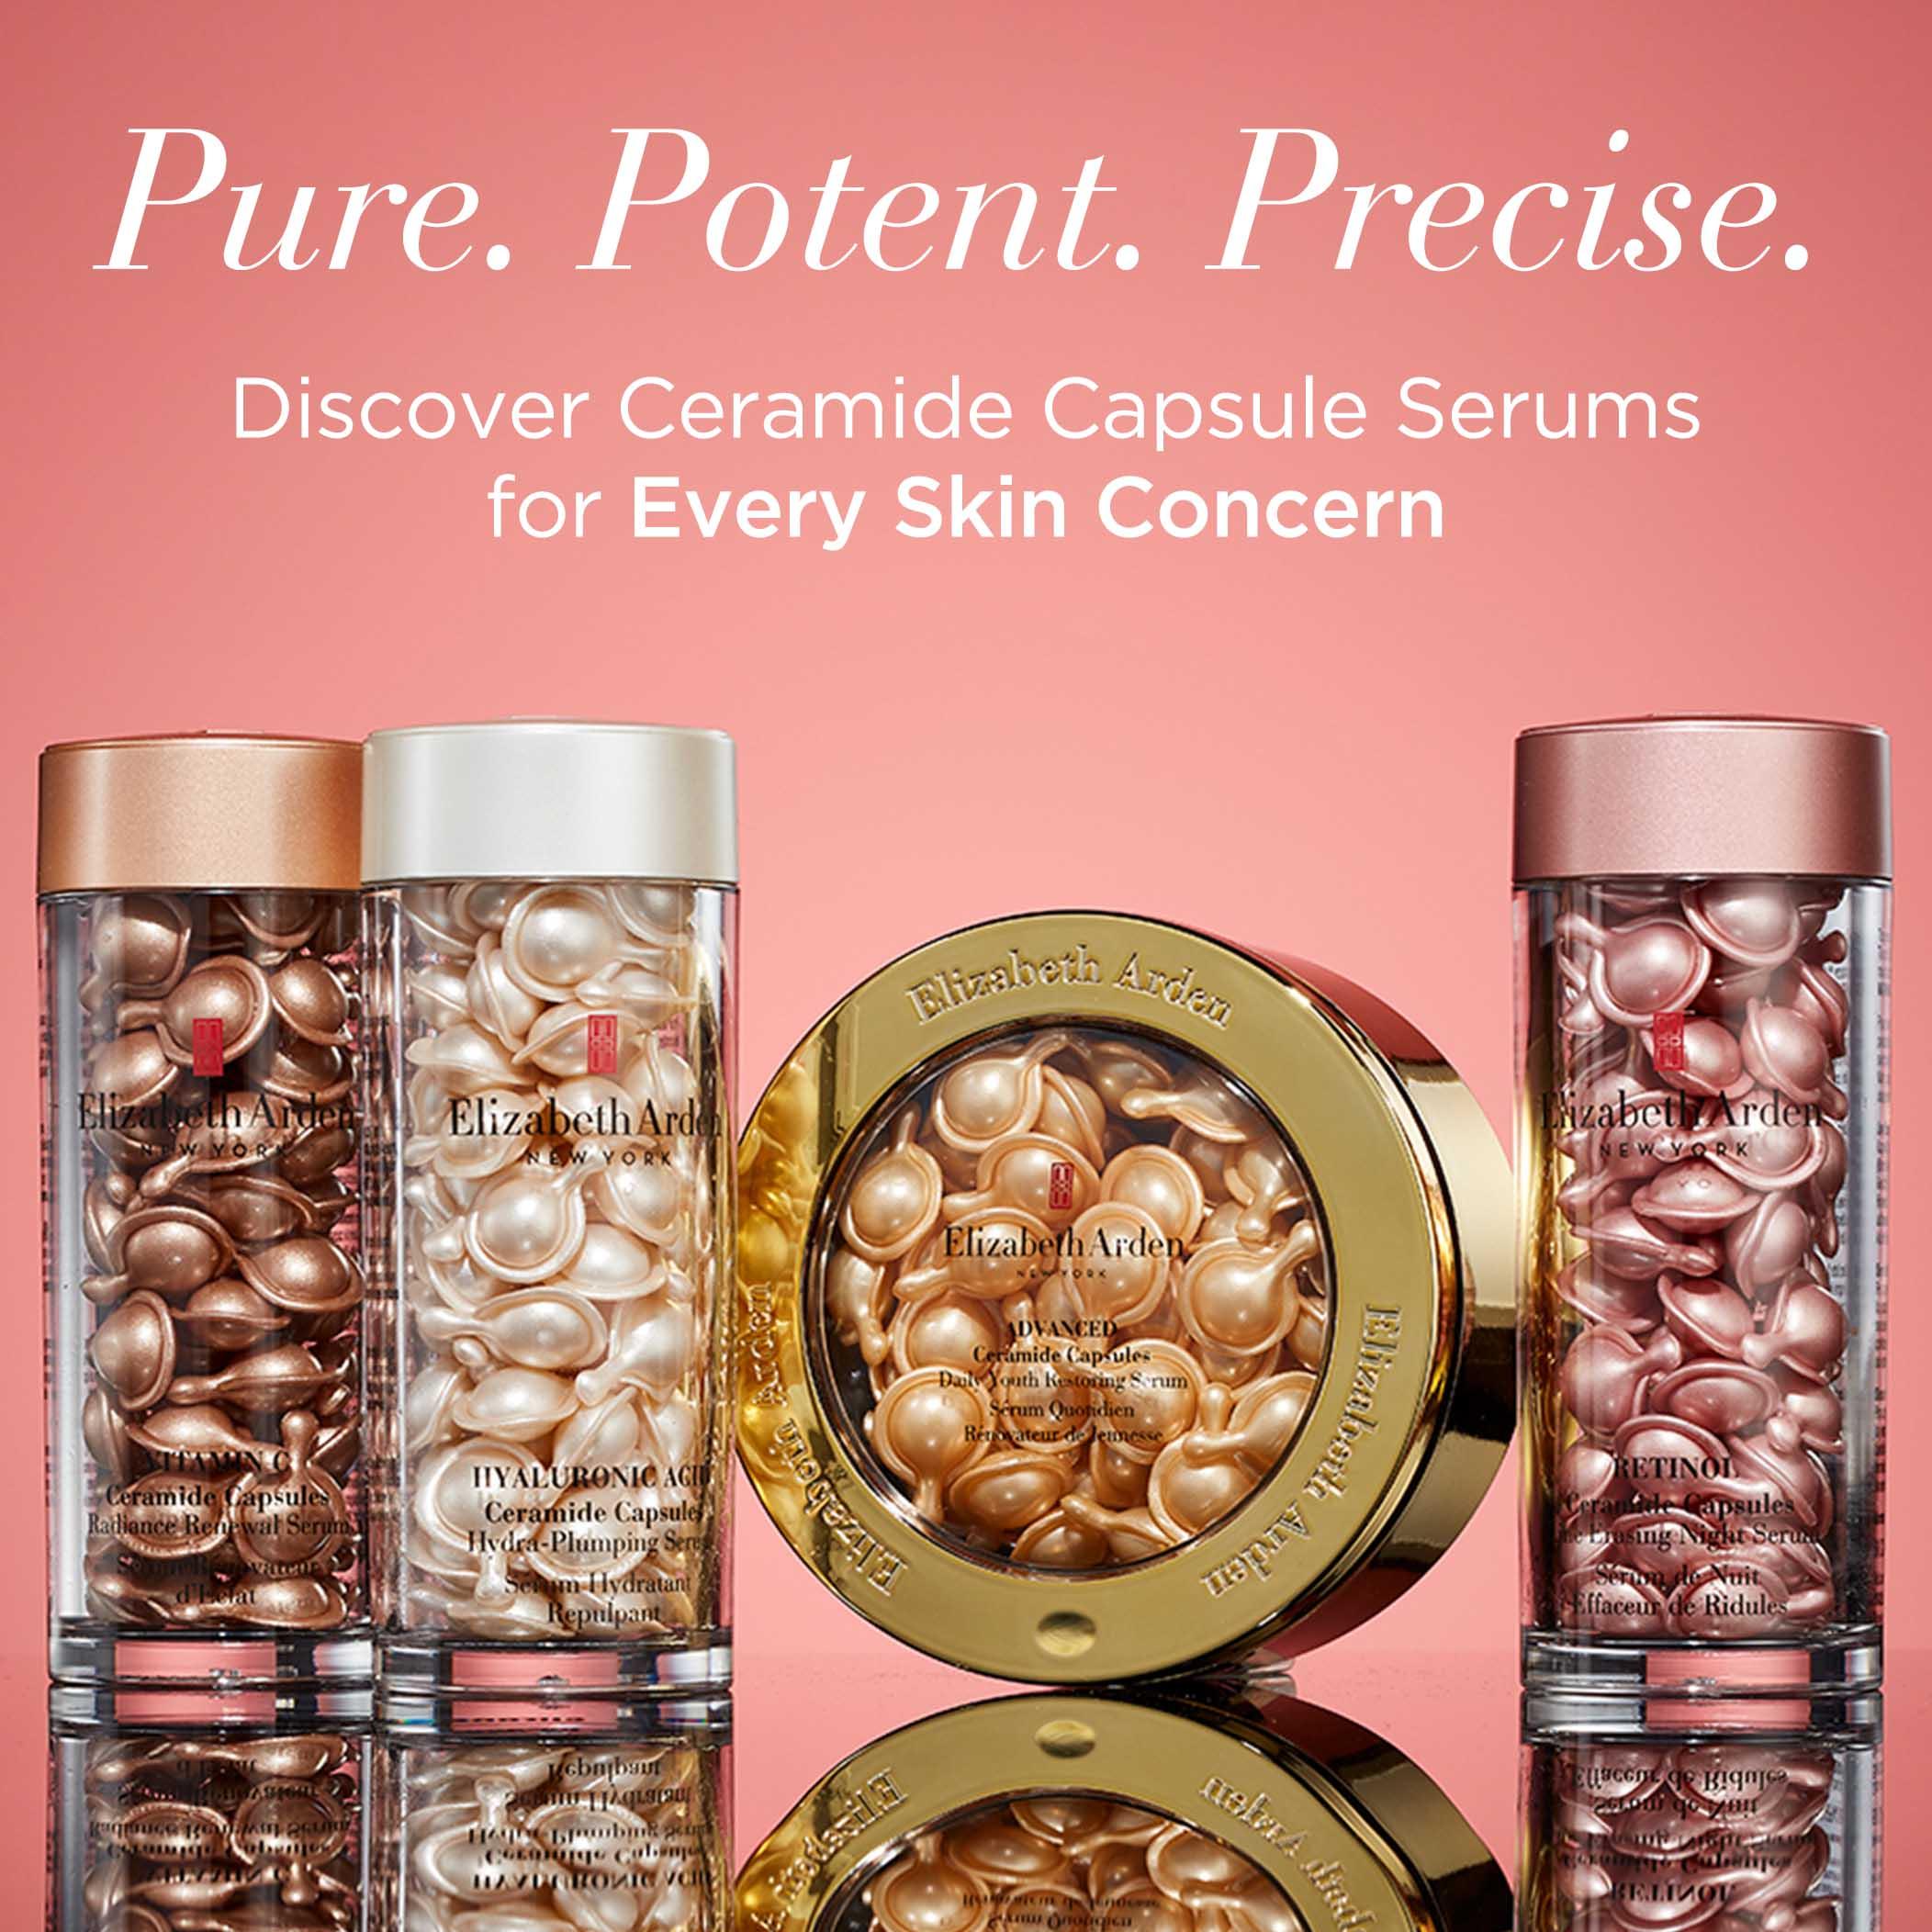 Discover Ceramide Capsules Serums for every skin concern